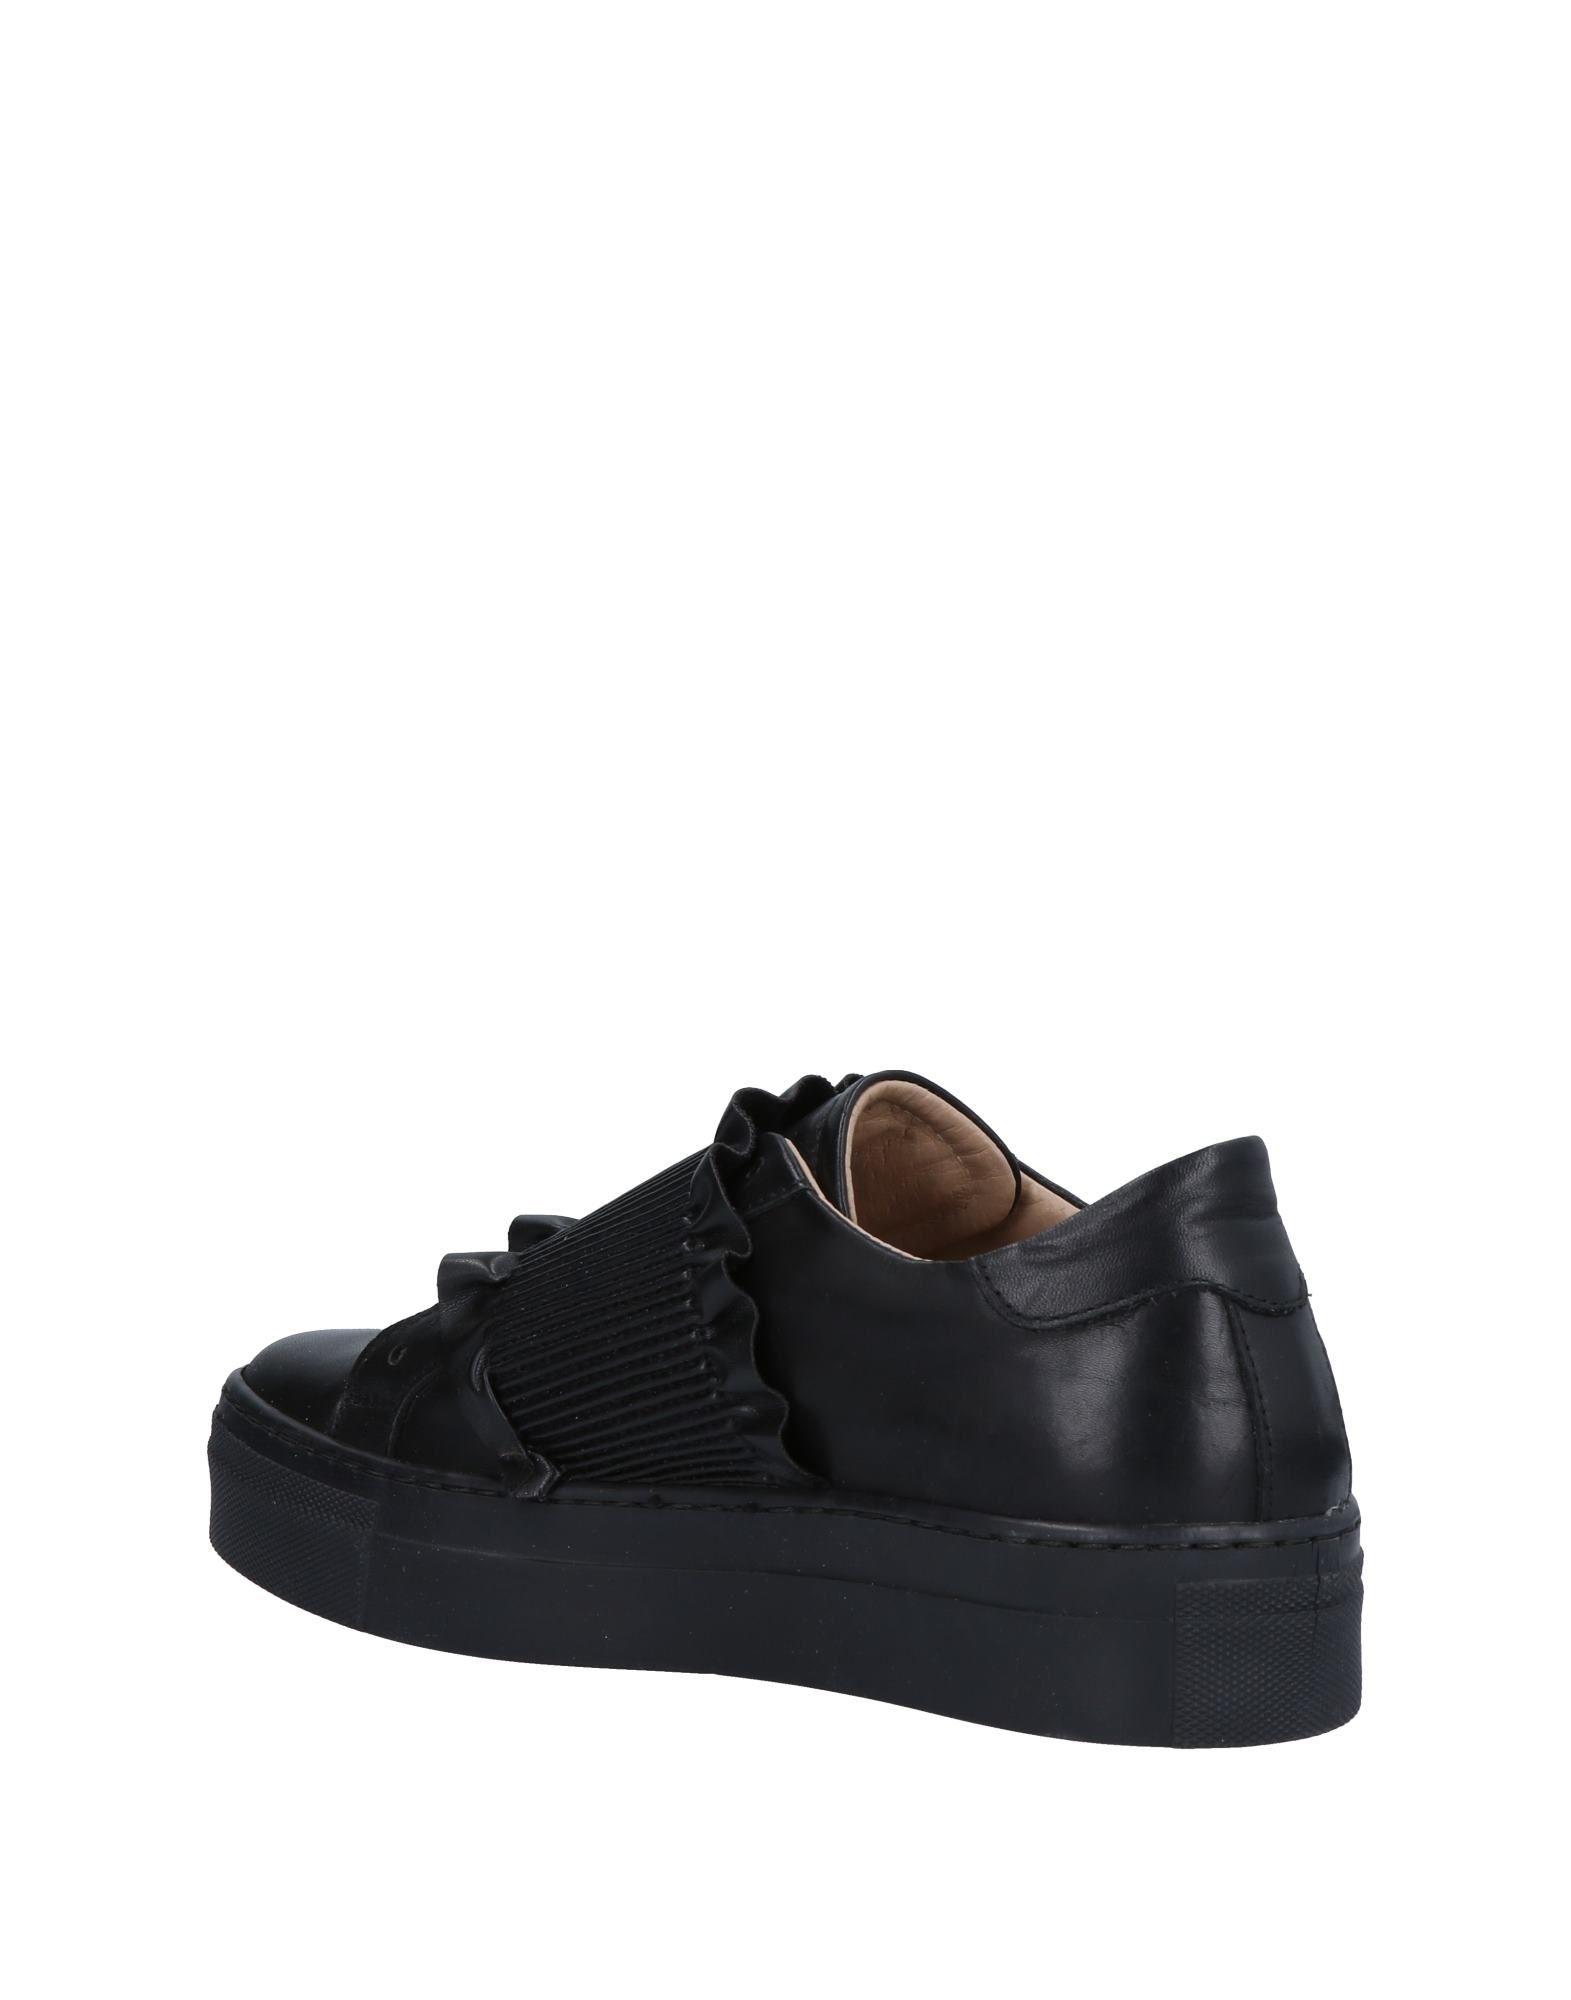 Loretta Pettinari Sneakers - Women Women Women Loretta Pettinari Sneakers online on  United Kingdom - 11494189FI ef99e0